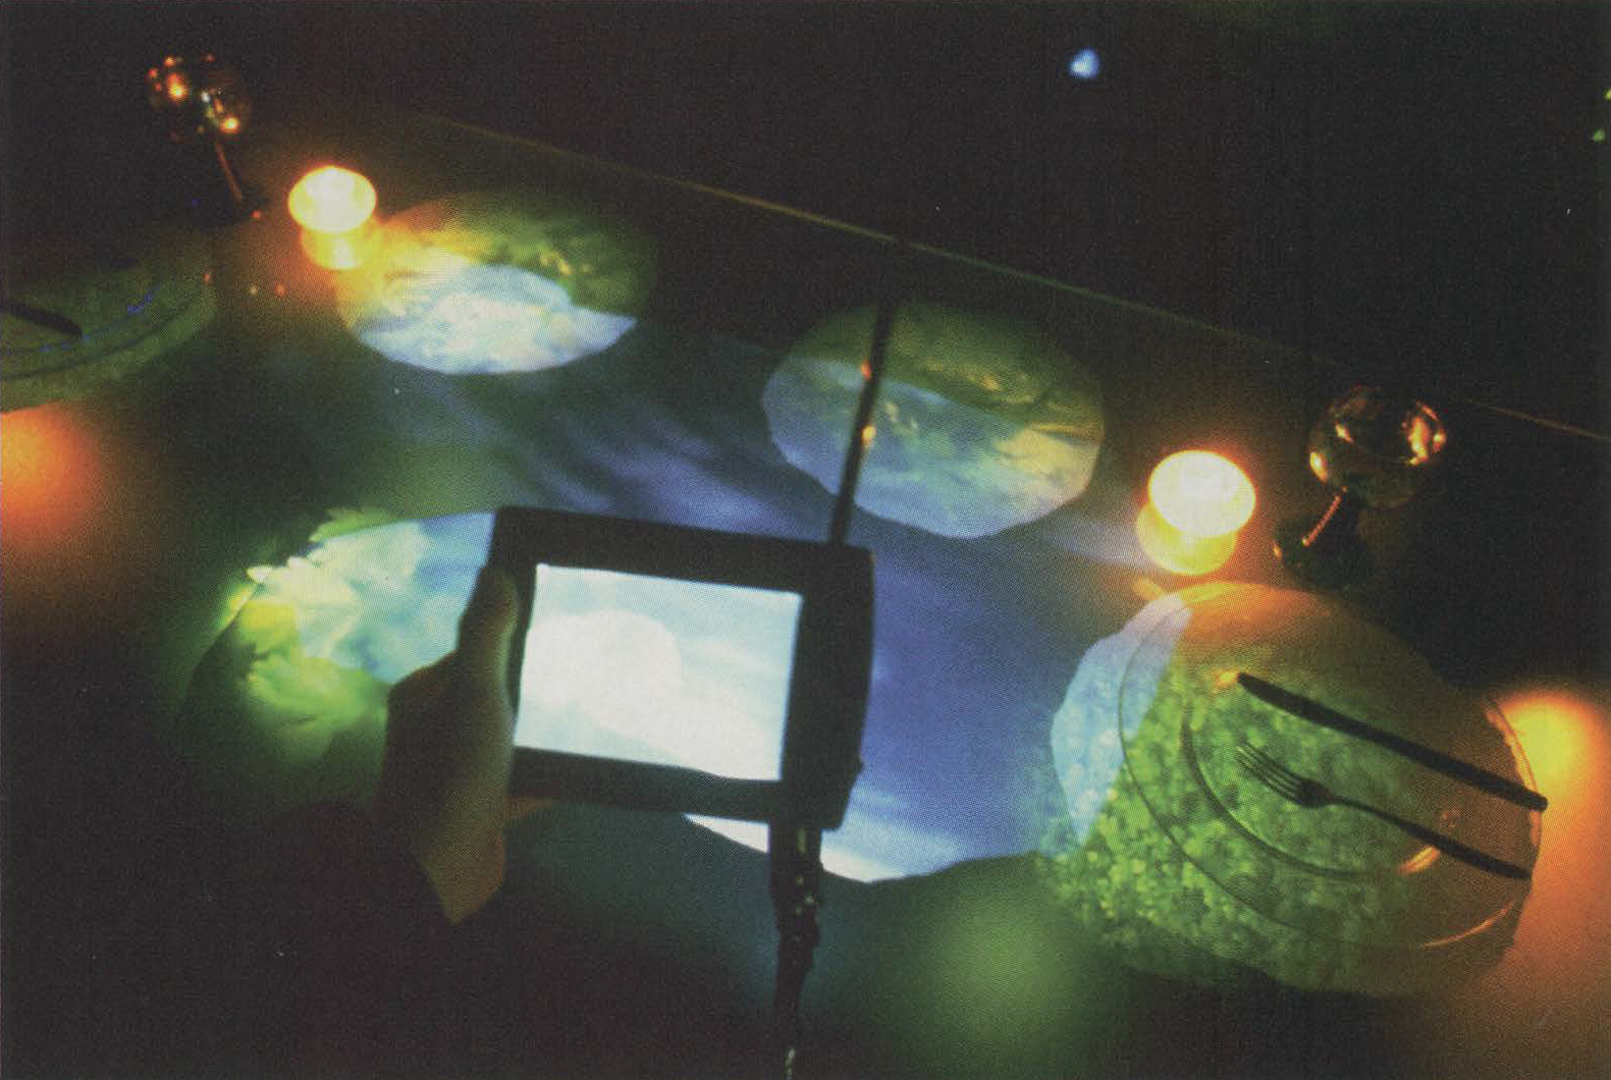 ©2000, Kumiko Kushiyama and Shinji Sasada